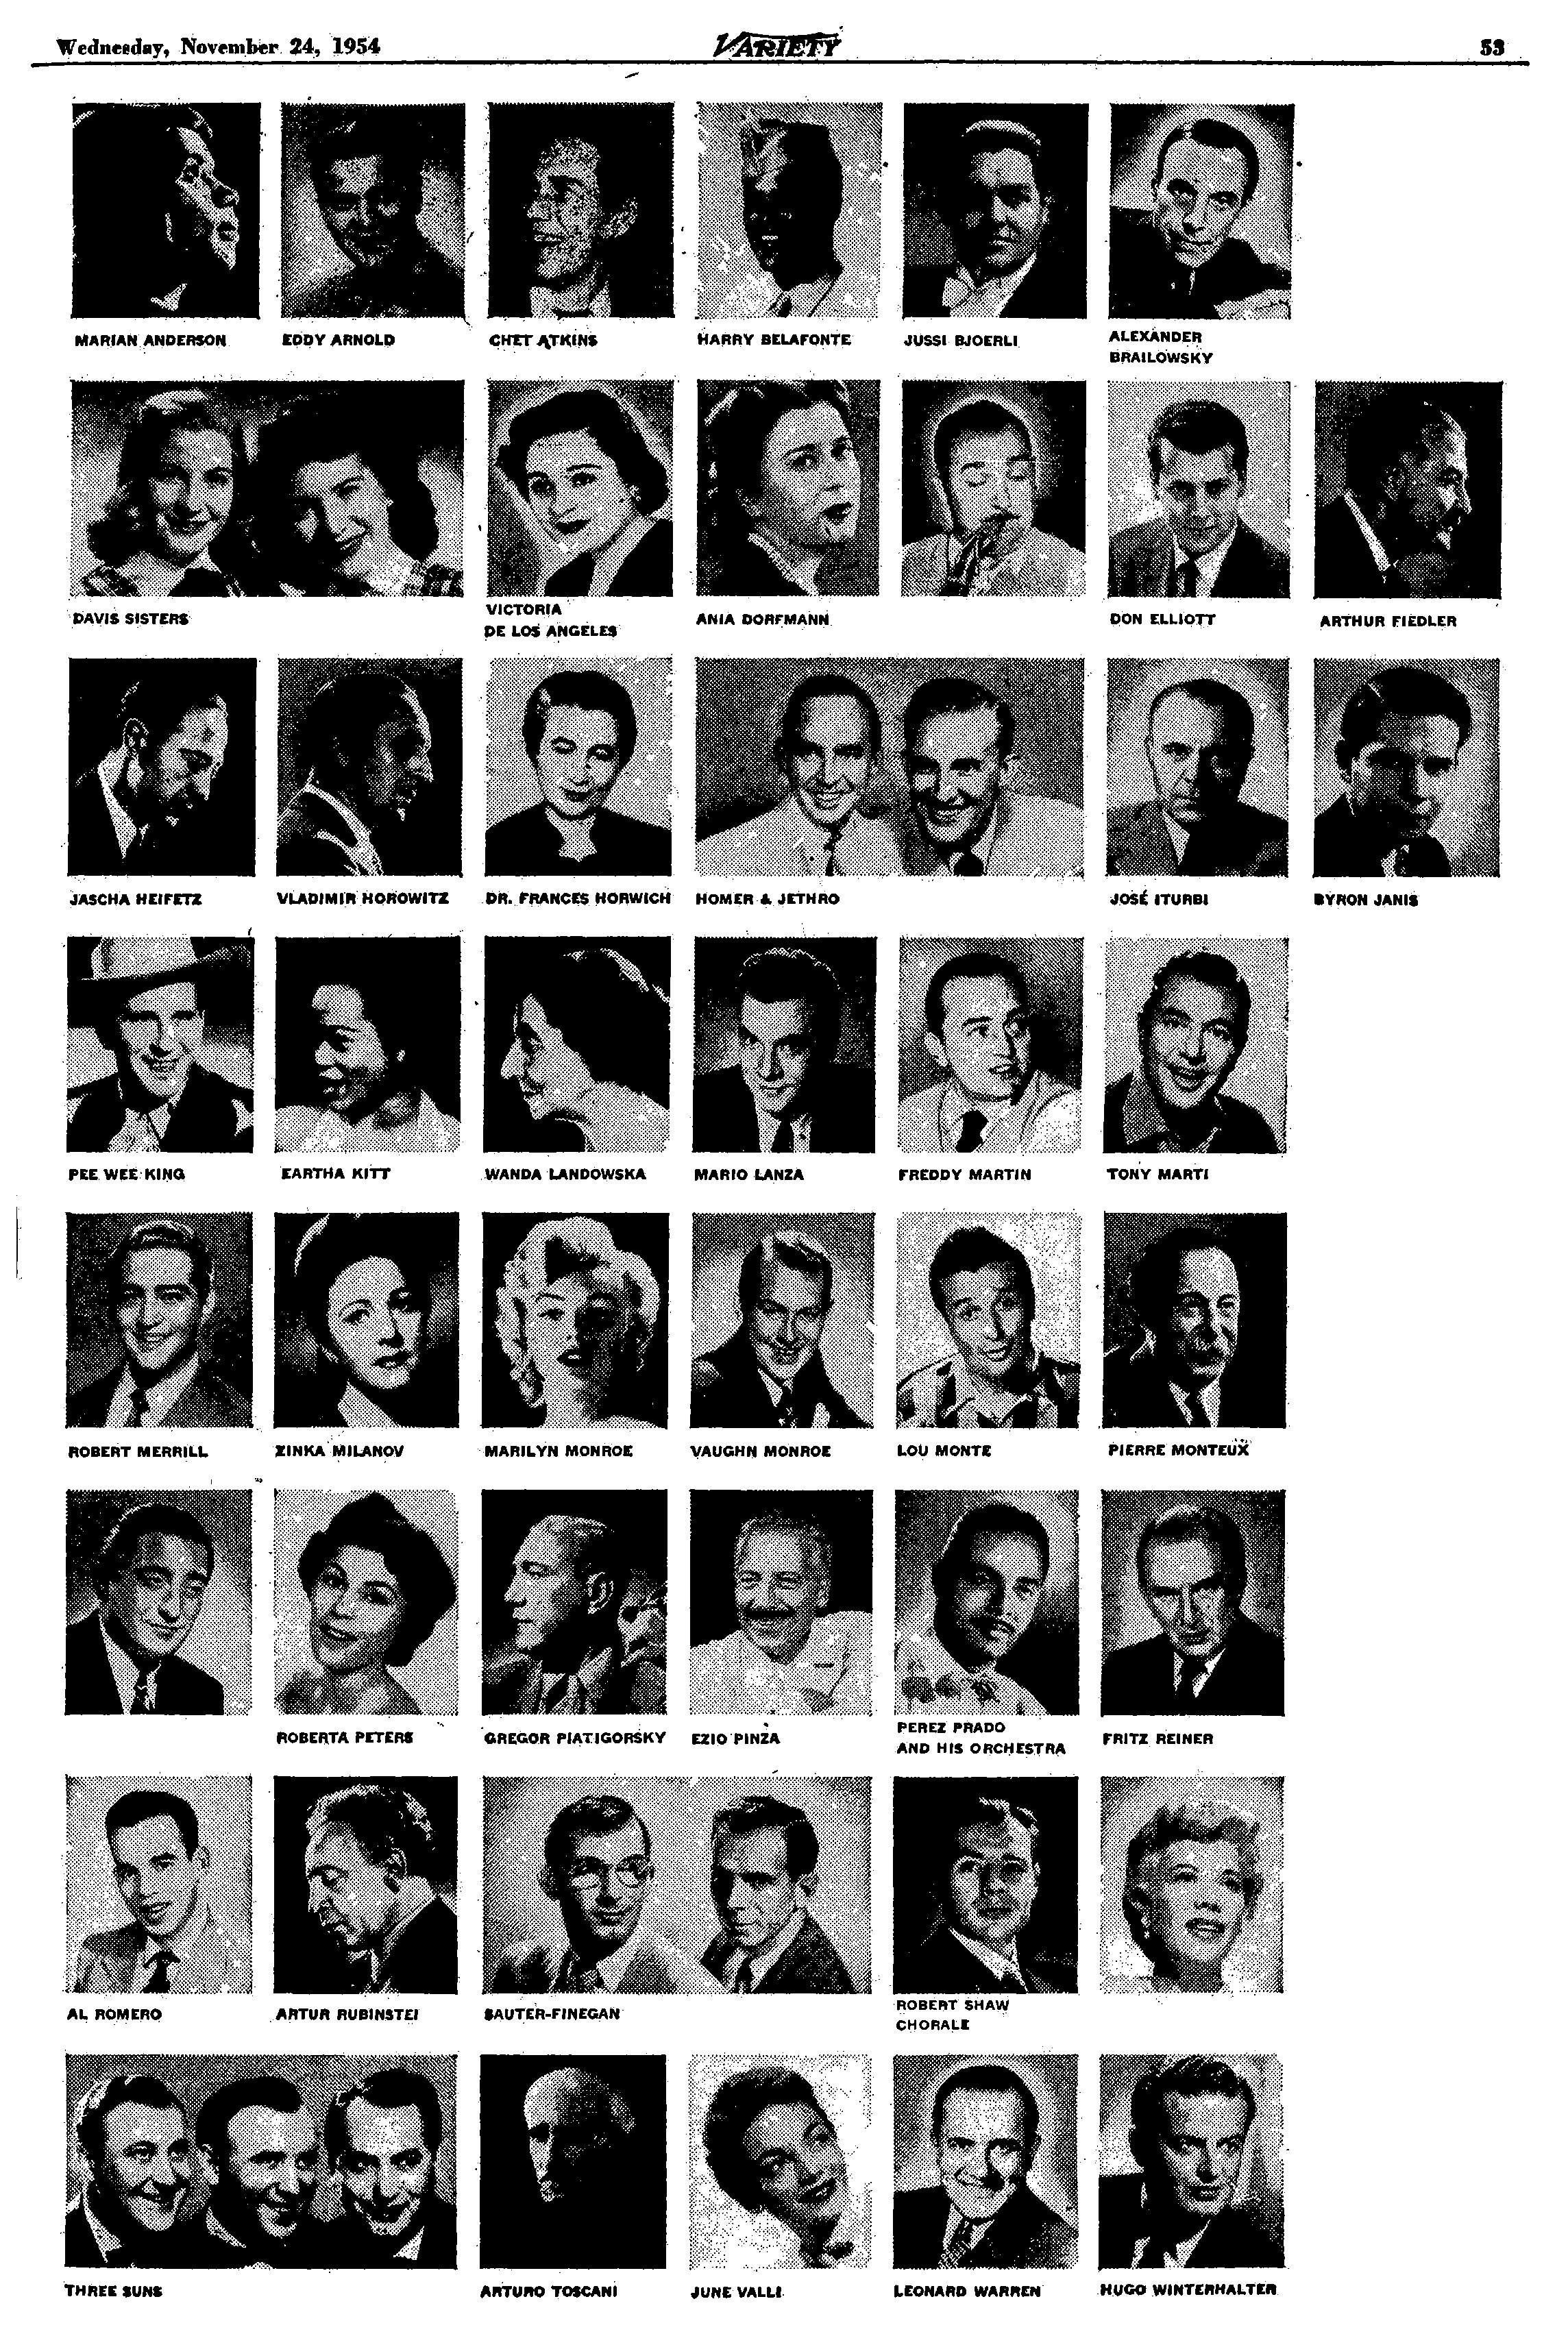 Variety196-1954-11_jp2.zip&file=variety196-1954-11_jp2%2fvariety196-1954-11_0268